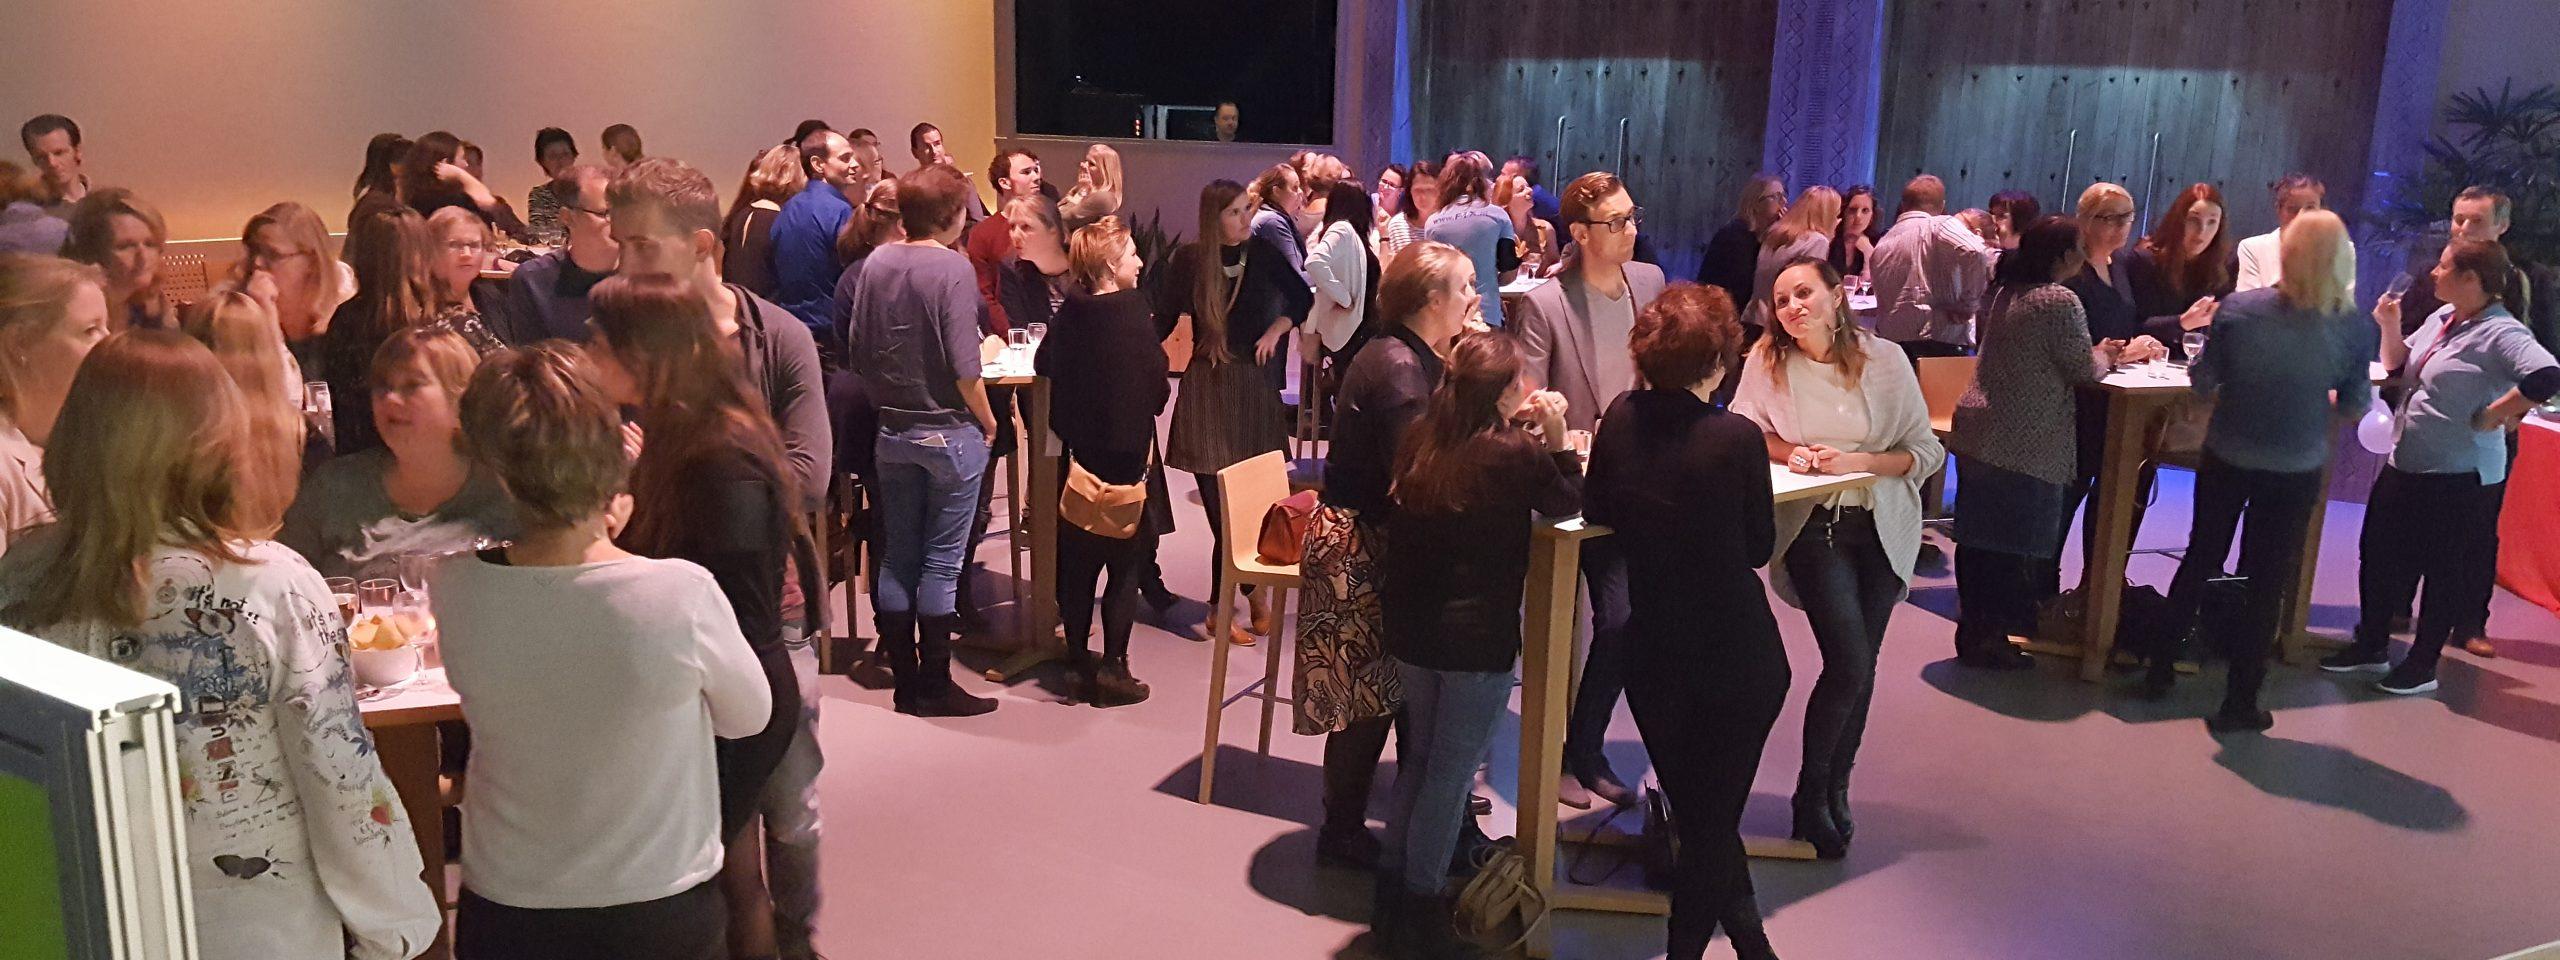 teamuitje-den-bosch-workshops-ranking-with-your-stars